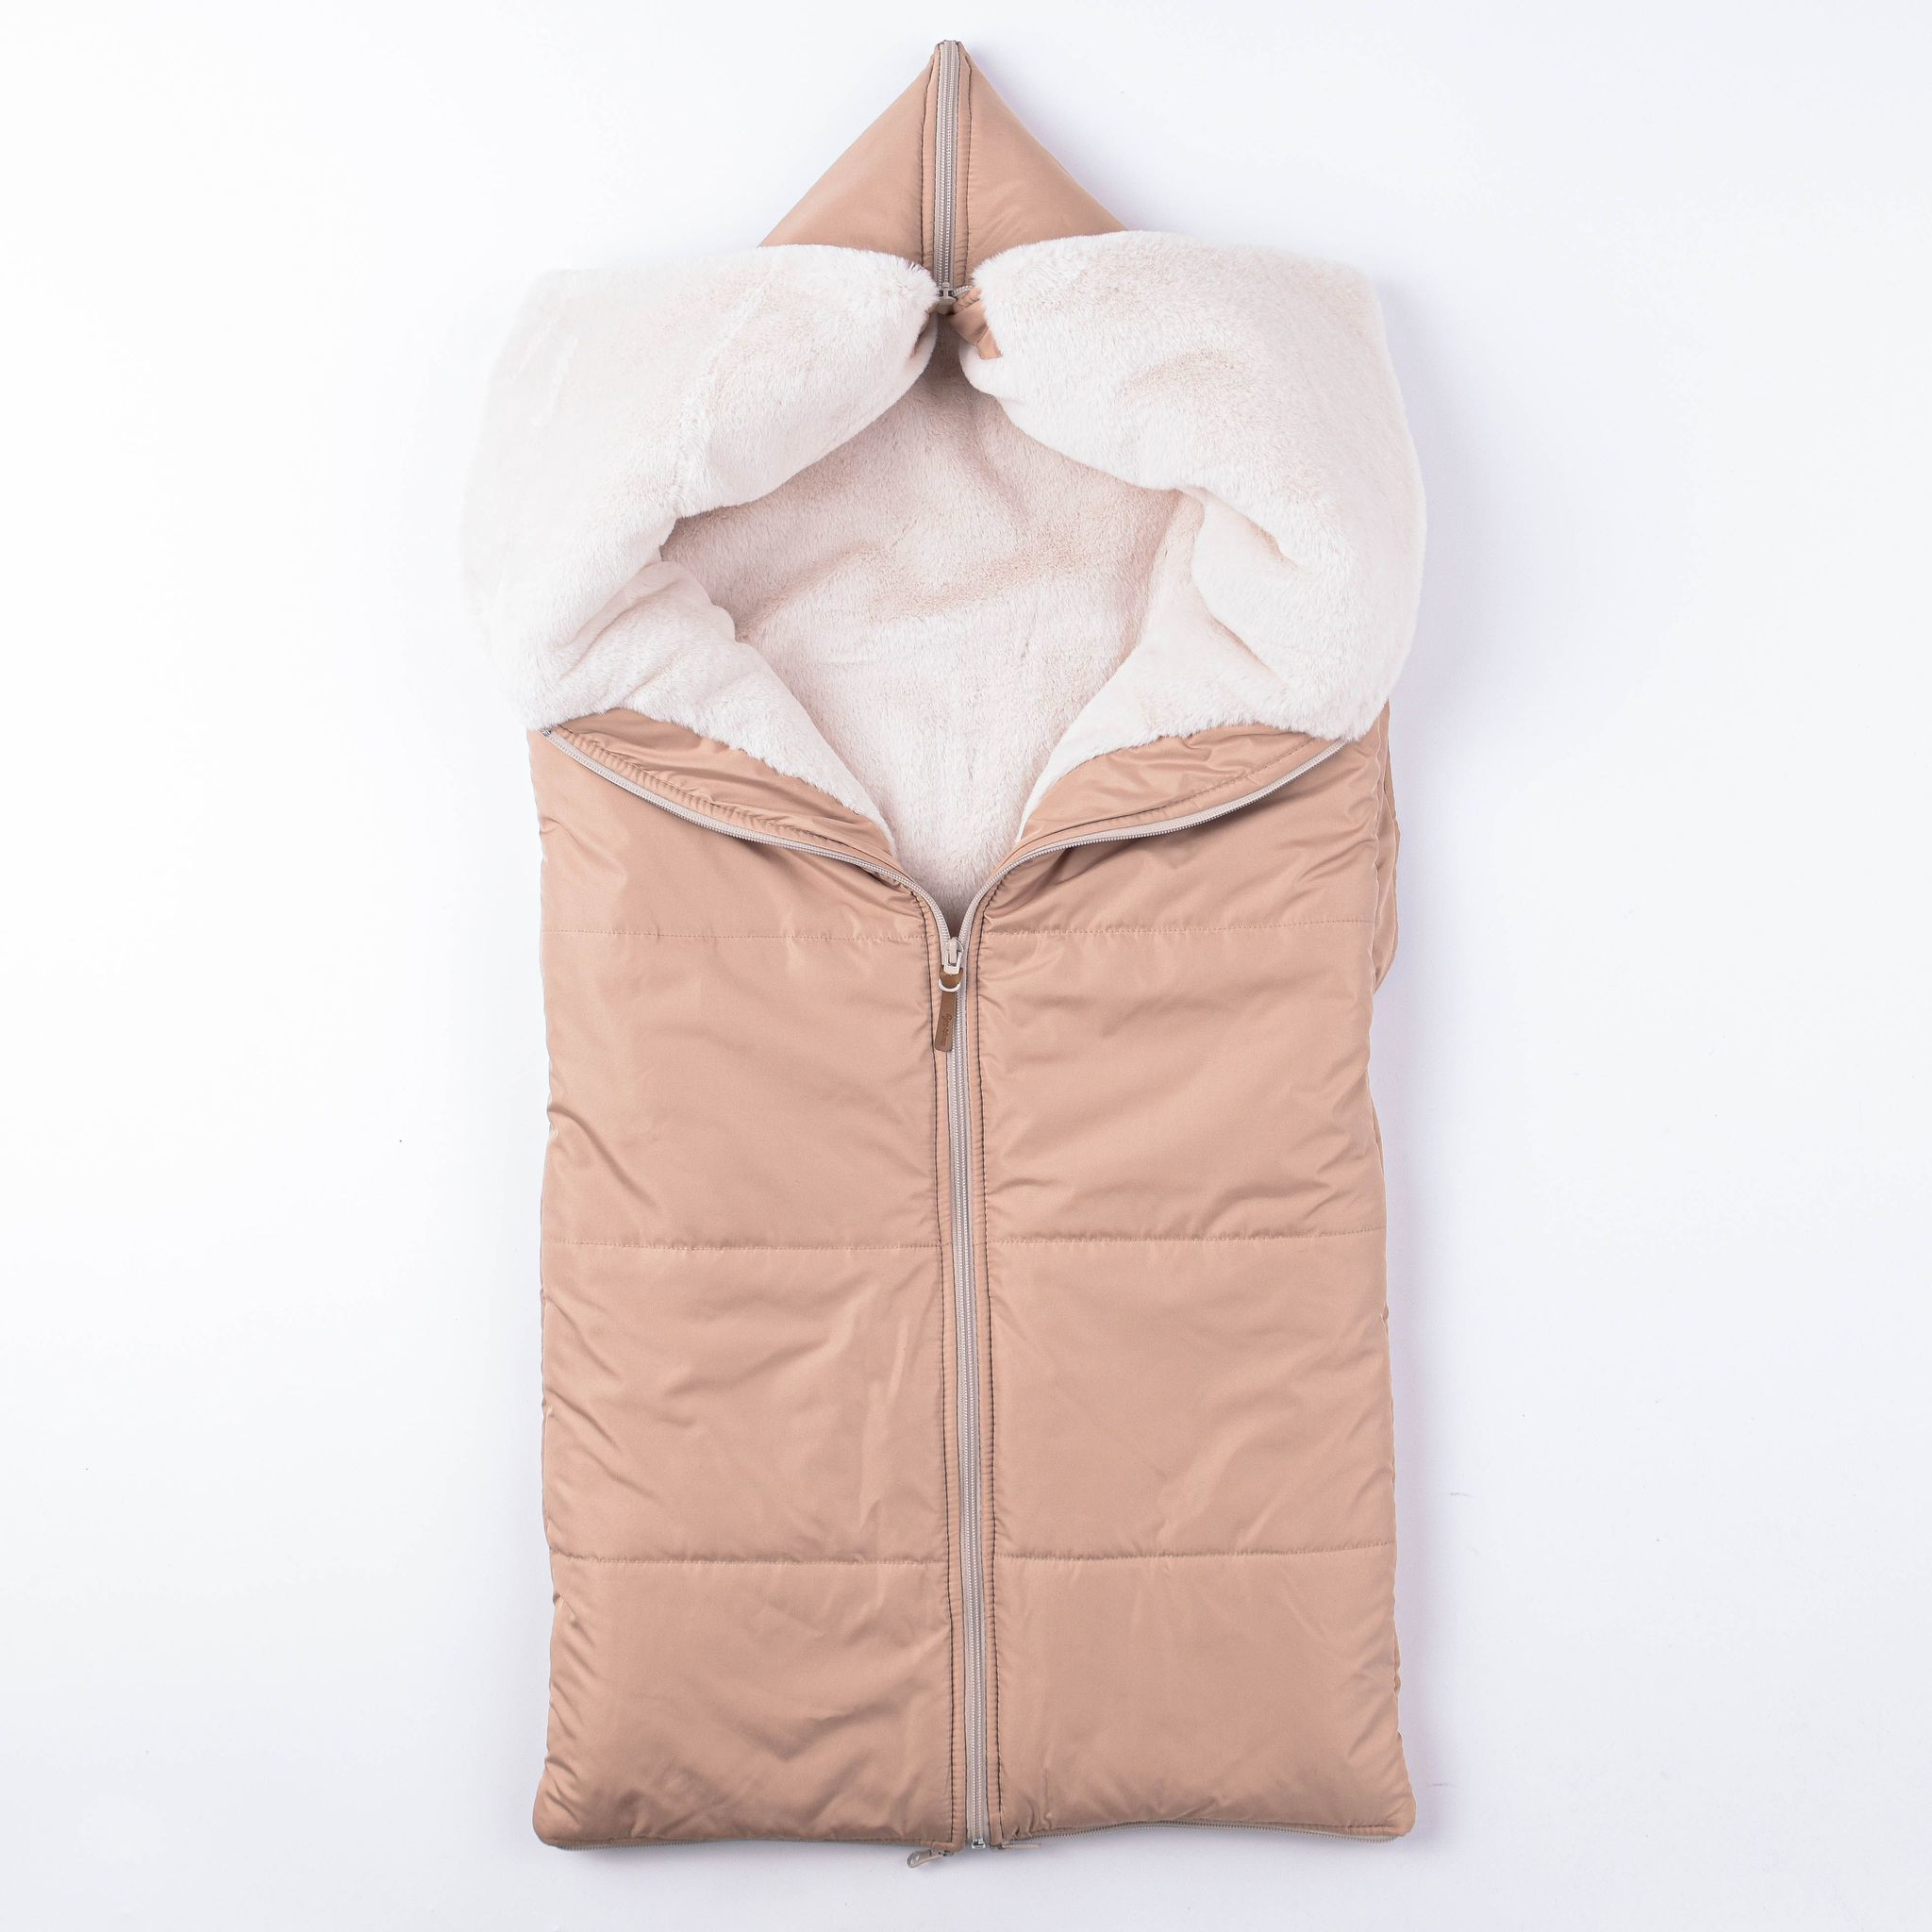 Envelope blanket with fur 0+, Heavy Cream